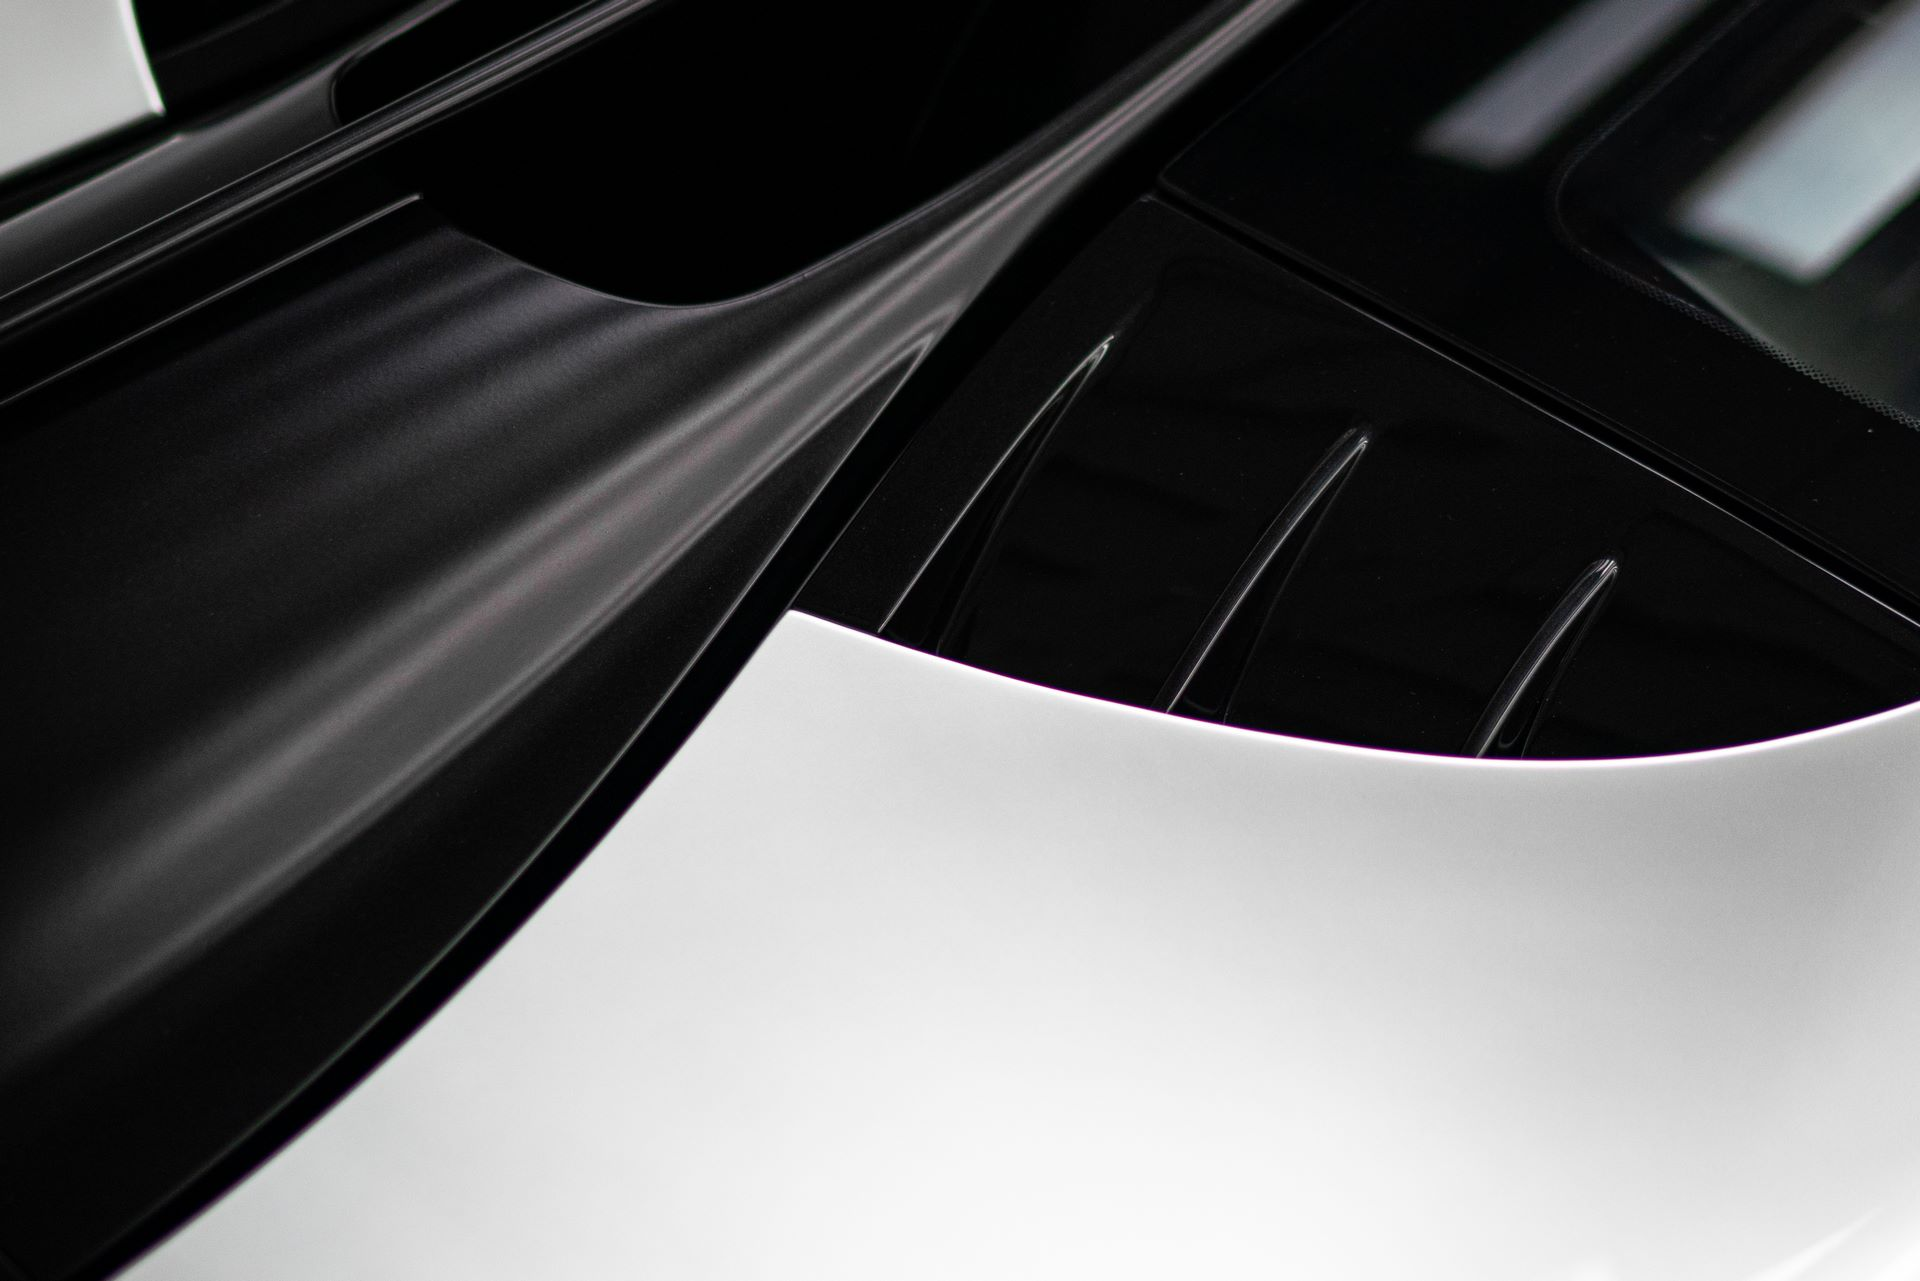 Gordon-Murray-Automotive-GMA-T50-40